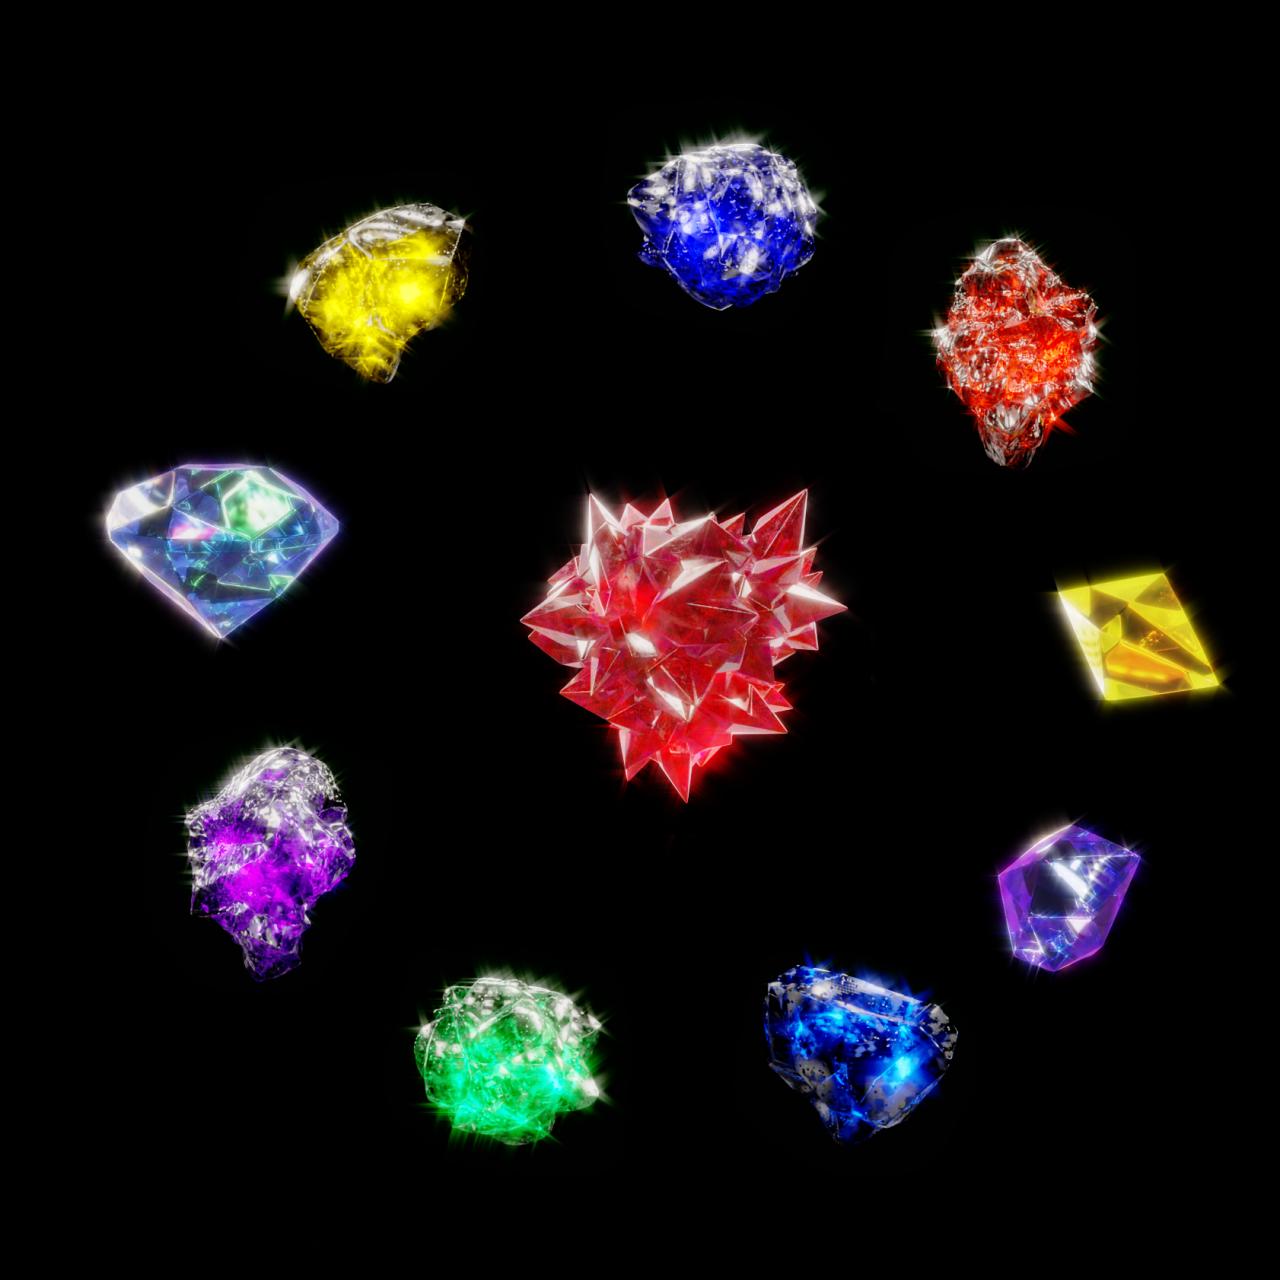 Sebastian Errazuriz's Digital Diamond Co. Creates NFTs Valued at Real Diamonds